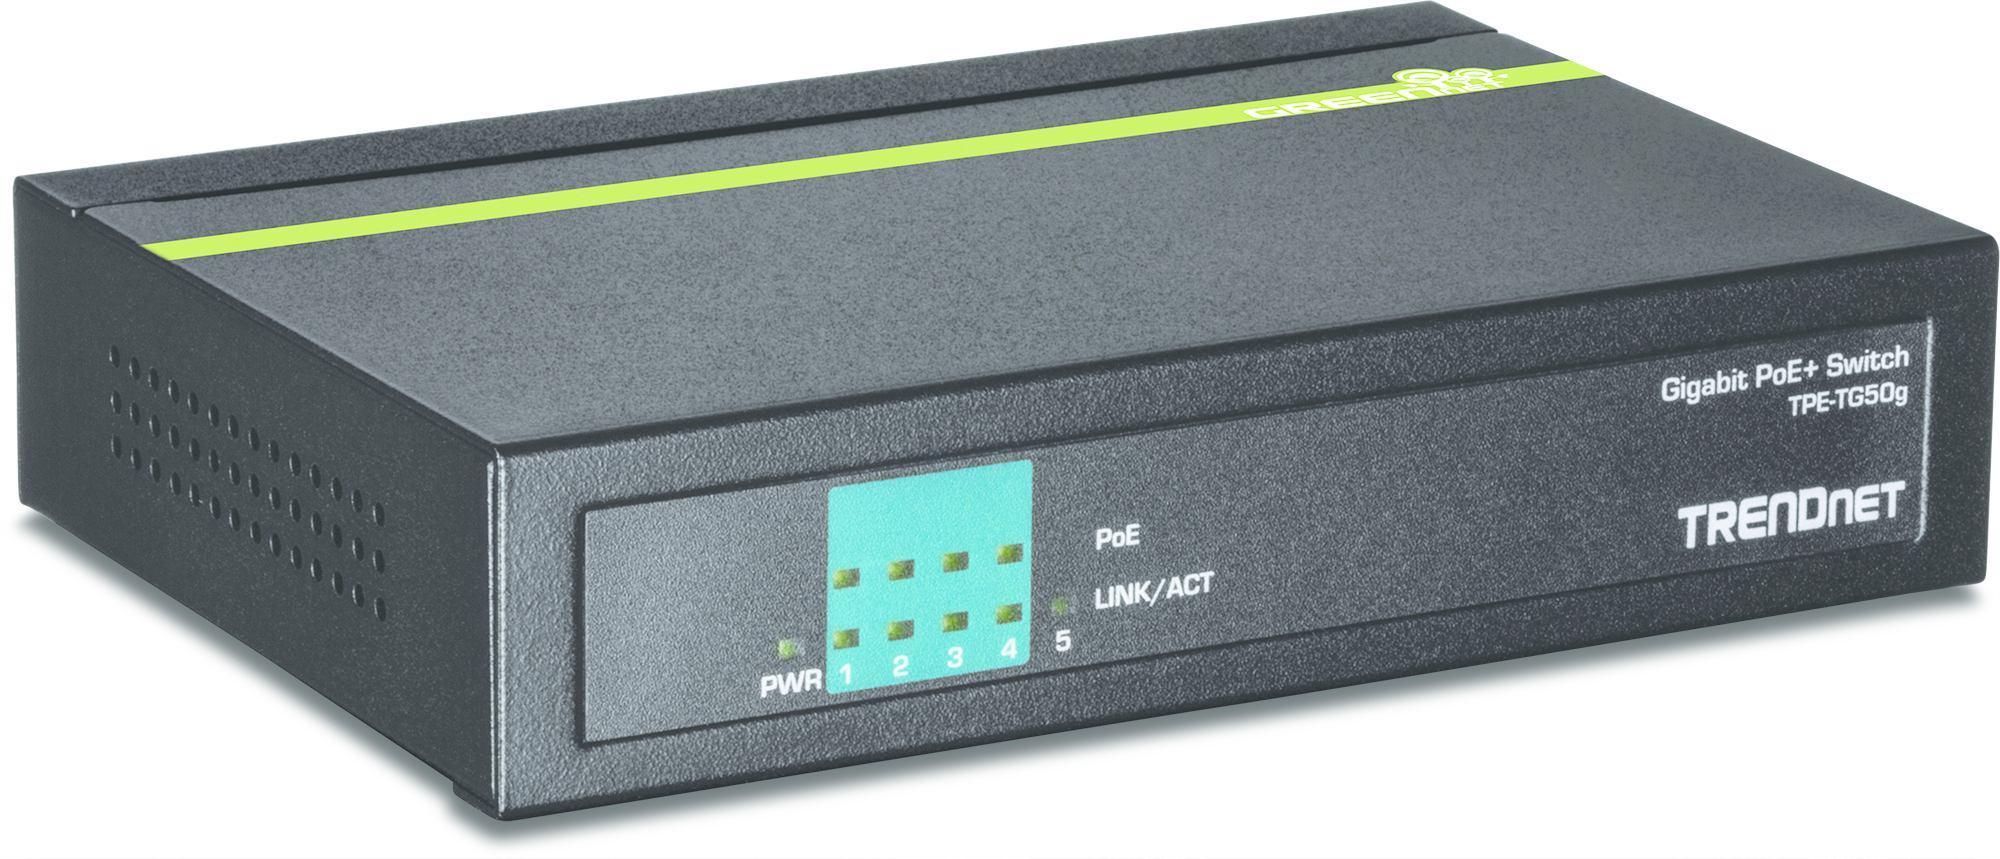 2022274-Trendnet-TPE-TG50g-Gigabit-Ethernet-10-100-1000-Nero-Supporto-Power-ov